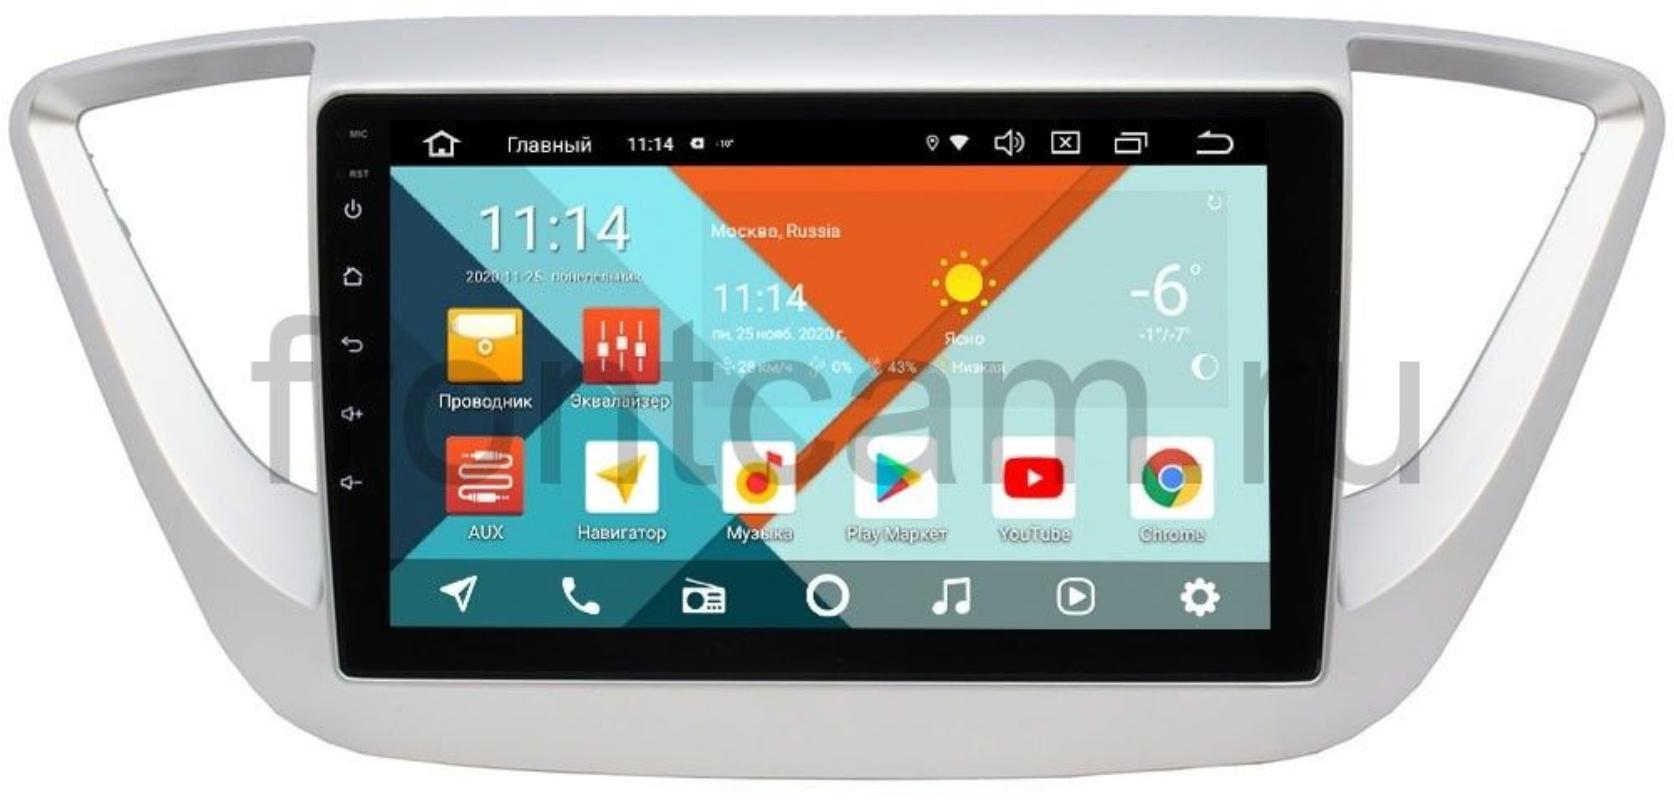 Штатная магнитола Hyundai Solaris II Wide Media KS9039QR-3/32 DSP CarPlay 4G-SIM на Android 10 (+ Камера заднего вида в подарок!)